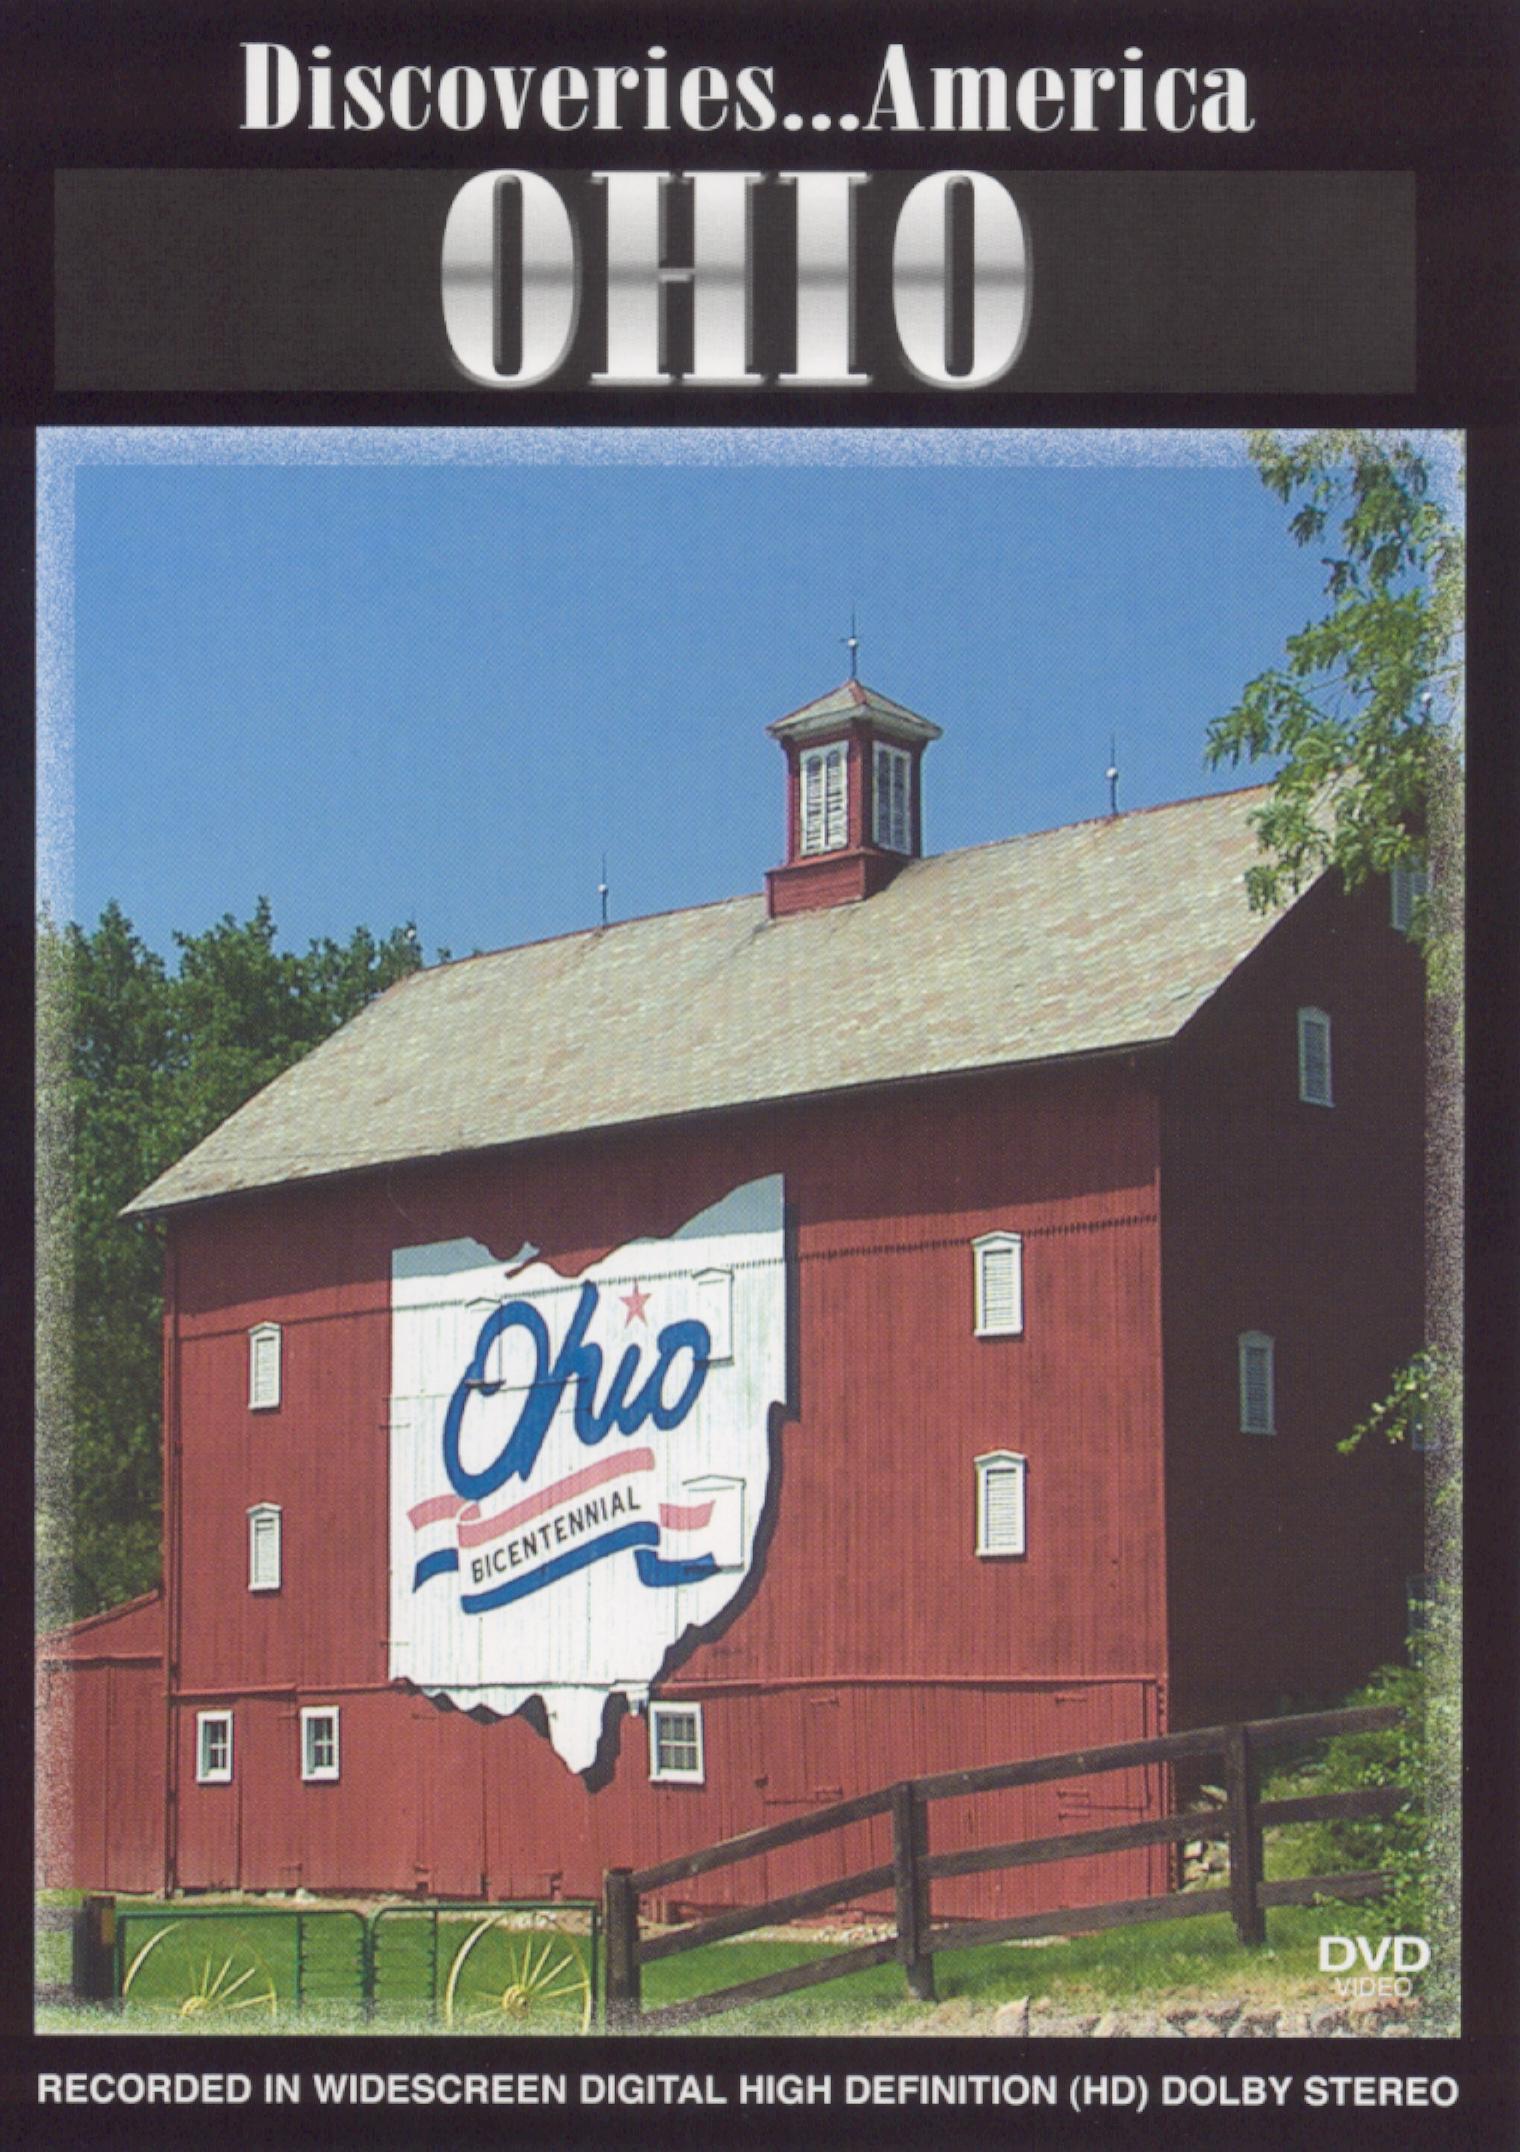 Discoveries... America: Ohio